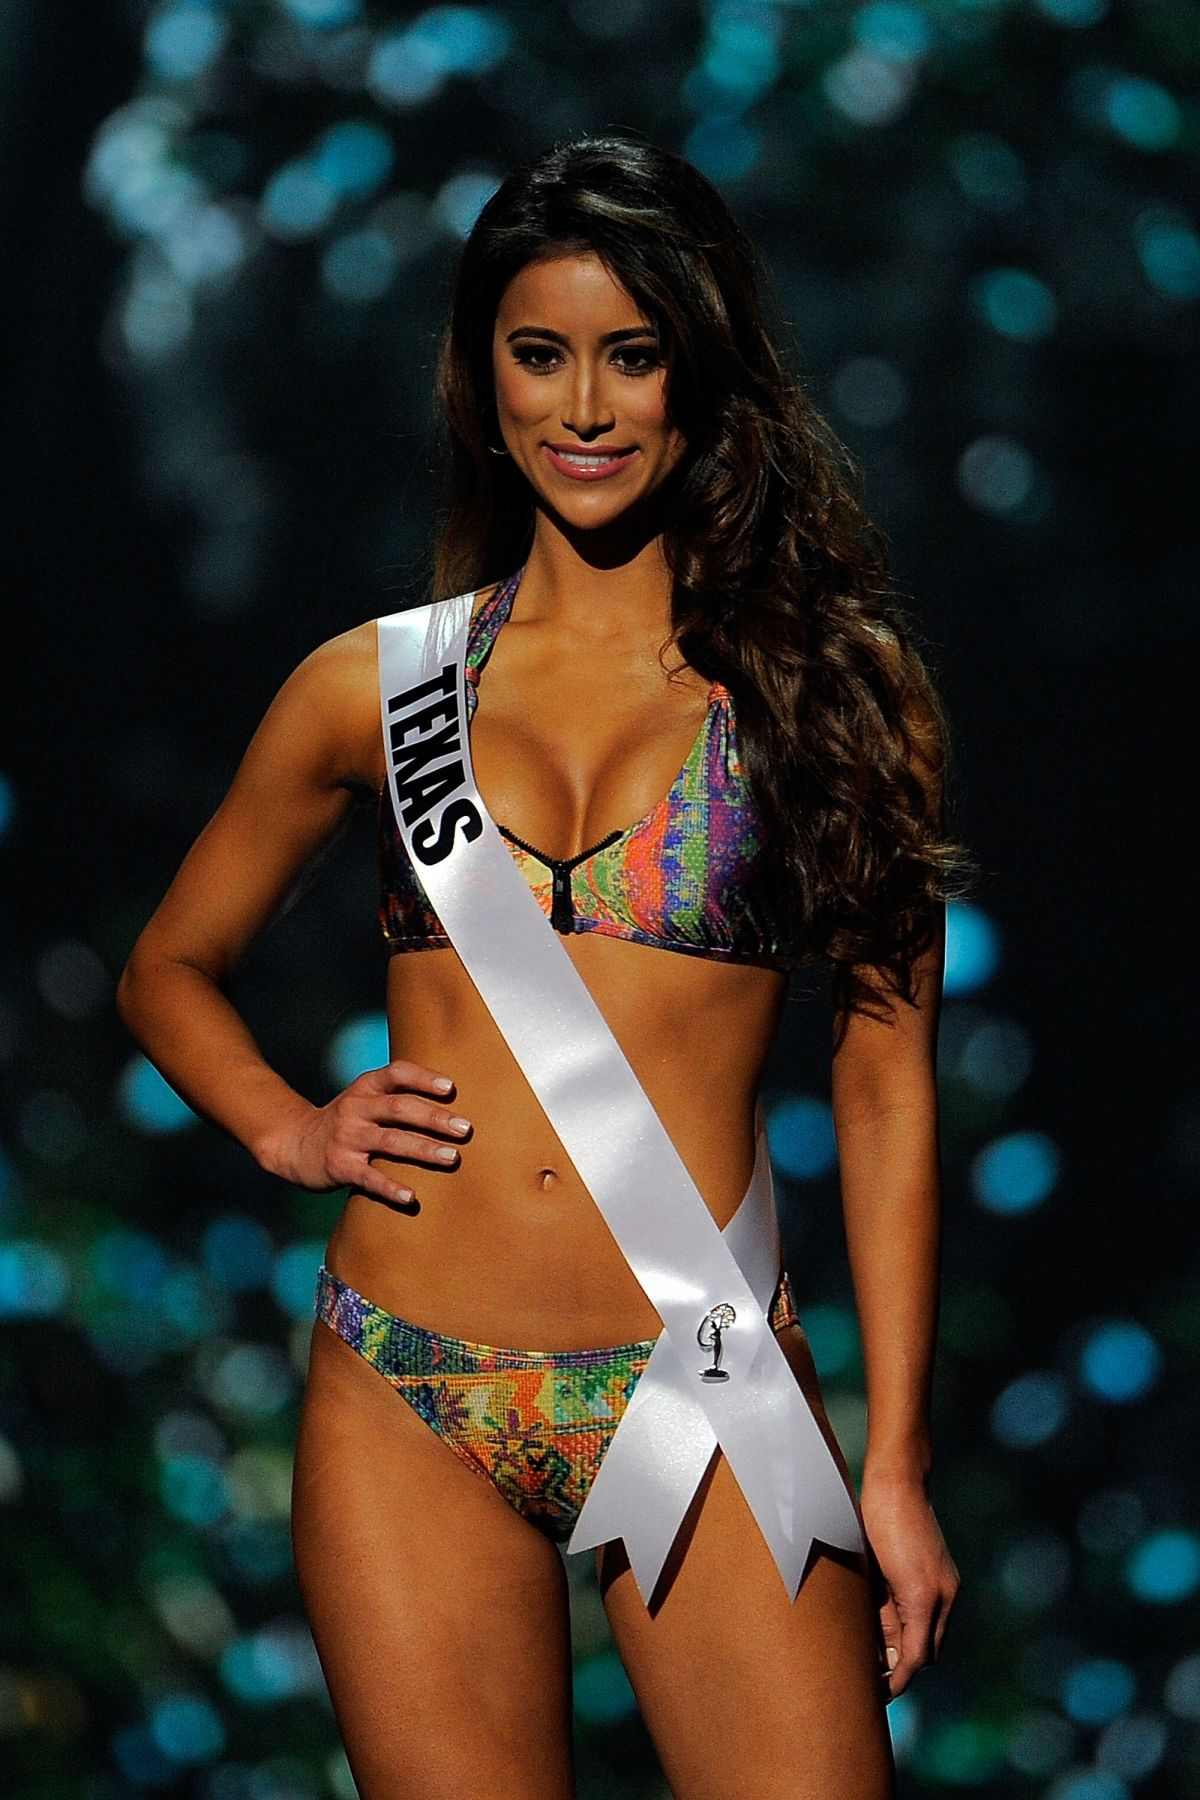 LAUREN GUZMAN at Miss USA 2014 Preliminary Competition